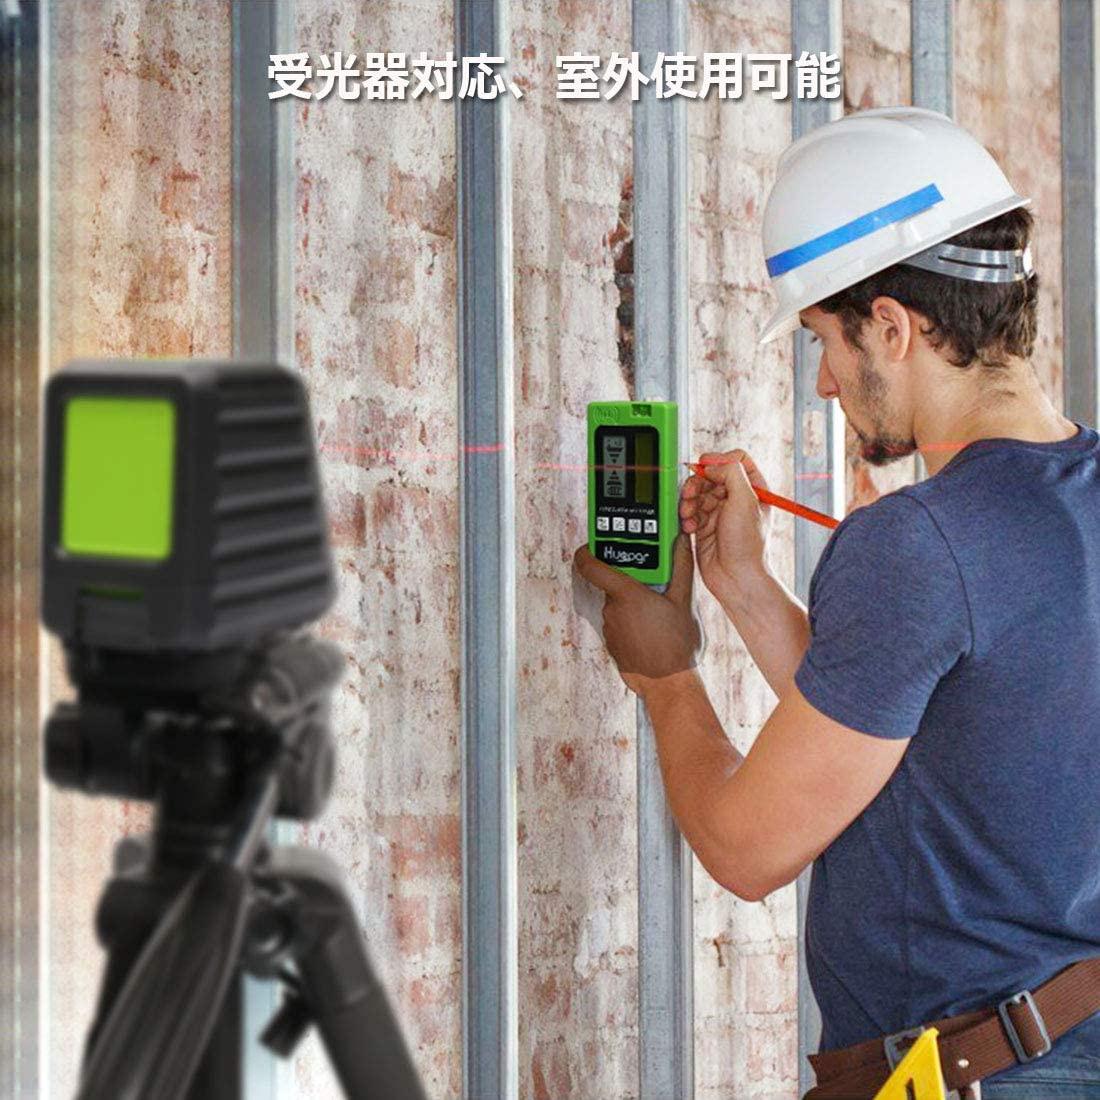 Huepar(ヒューパー) 2ライン レーザー墨出し器 M-BOX-1Rの商品画像5